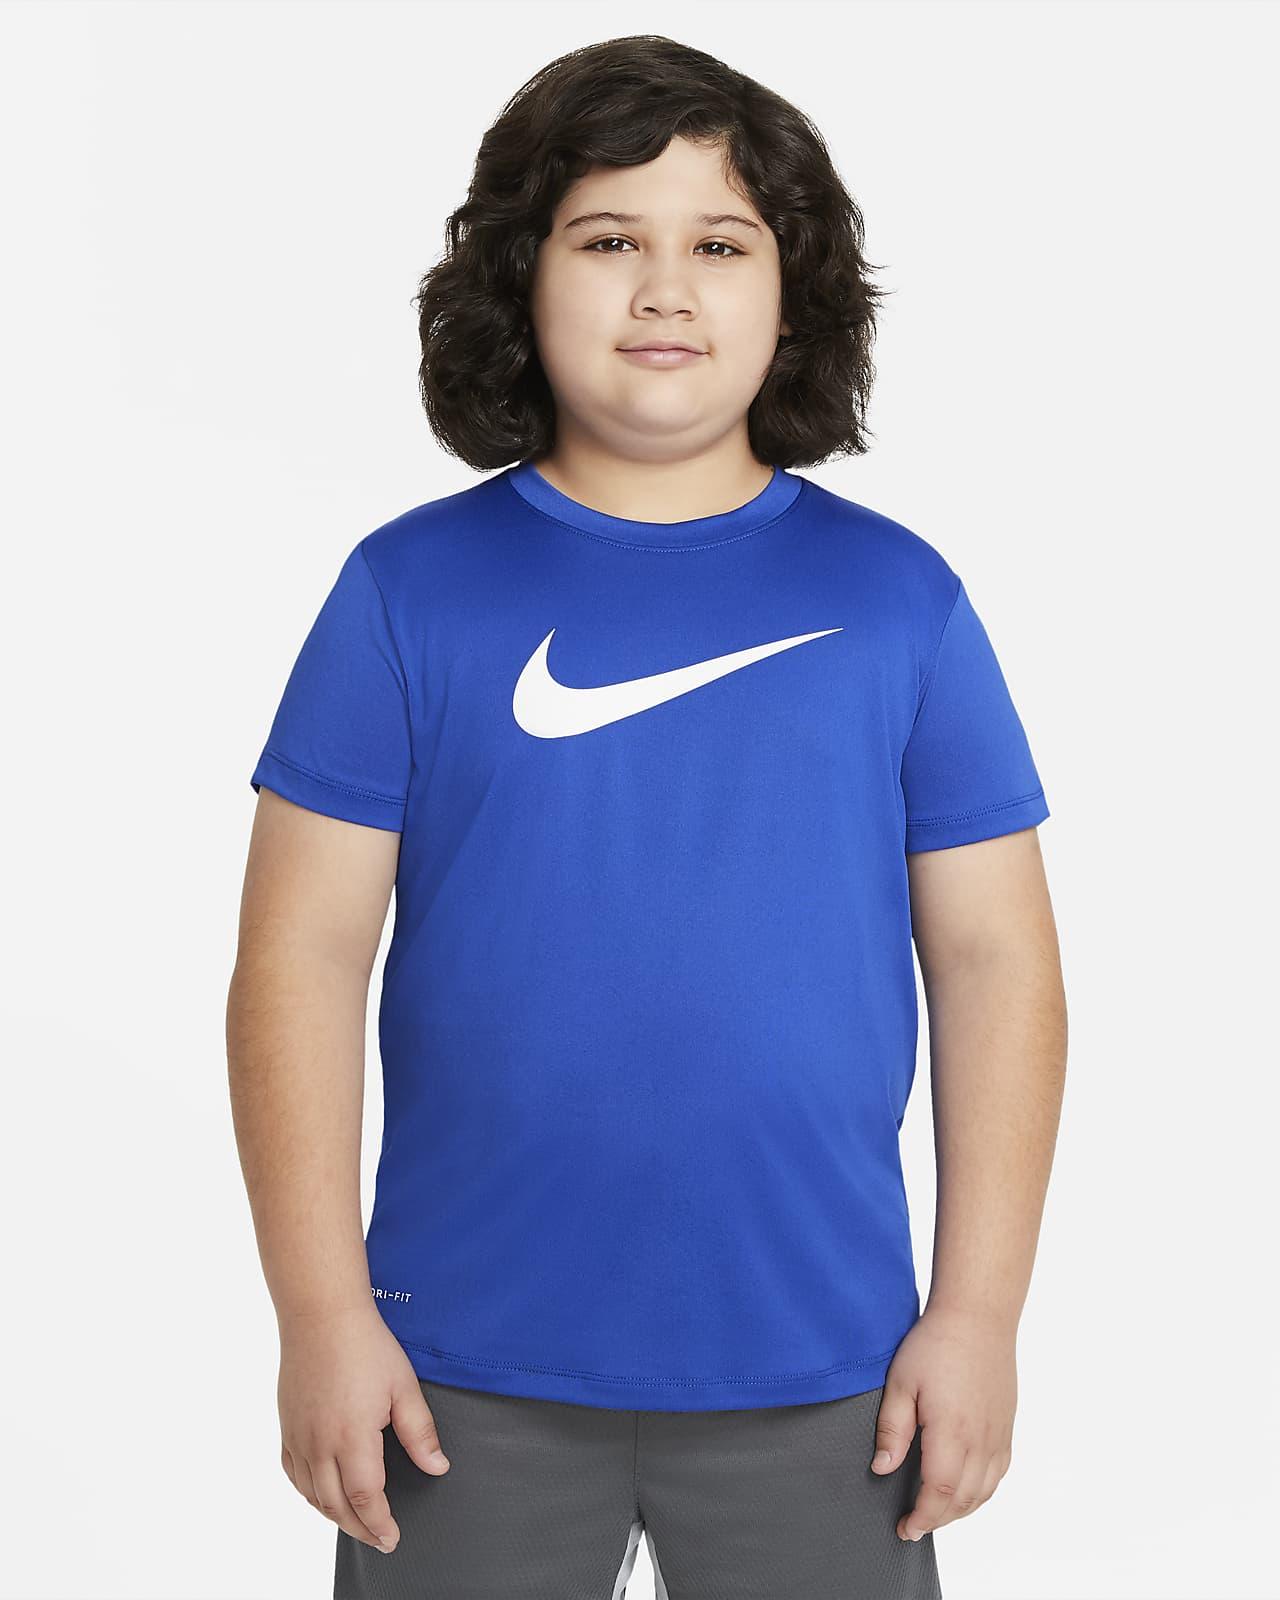 Nike Dri-FIT Big Kids' (Boys') Training T-Shirt (Extended Size)